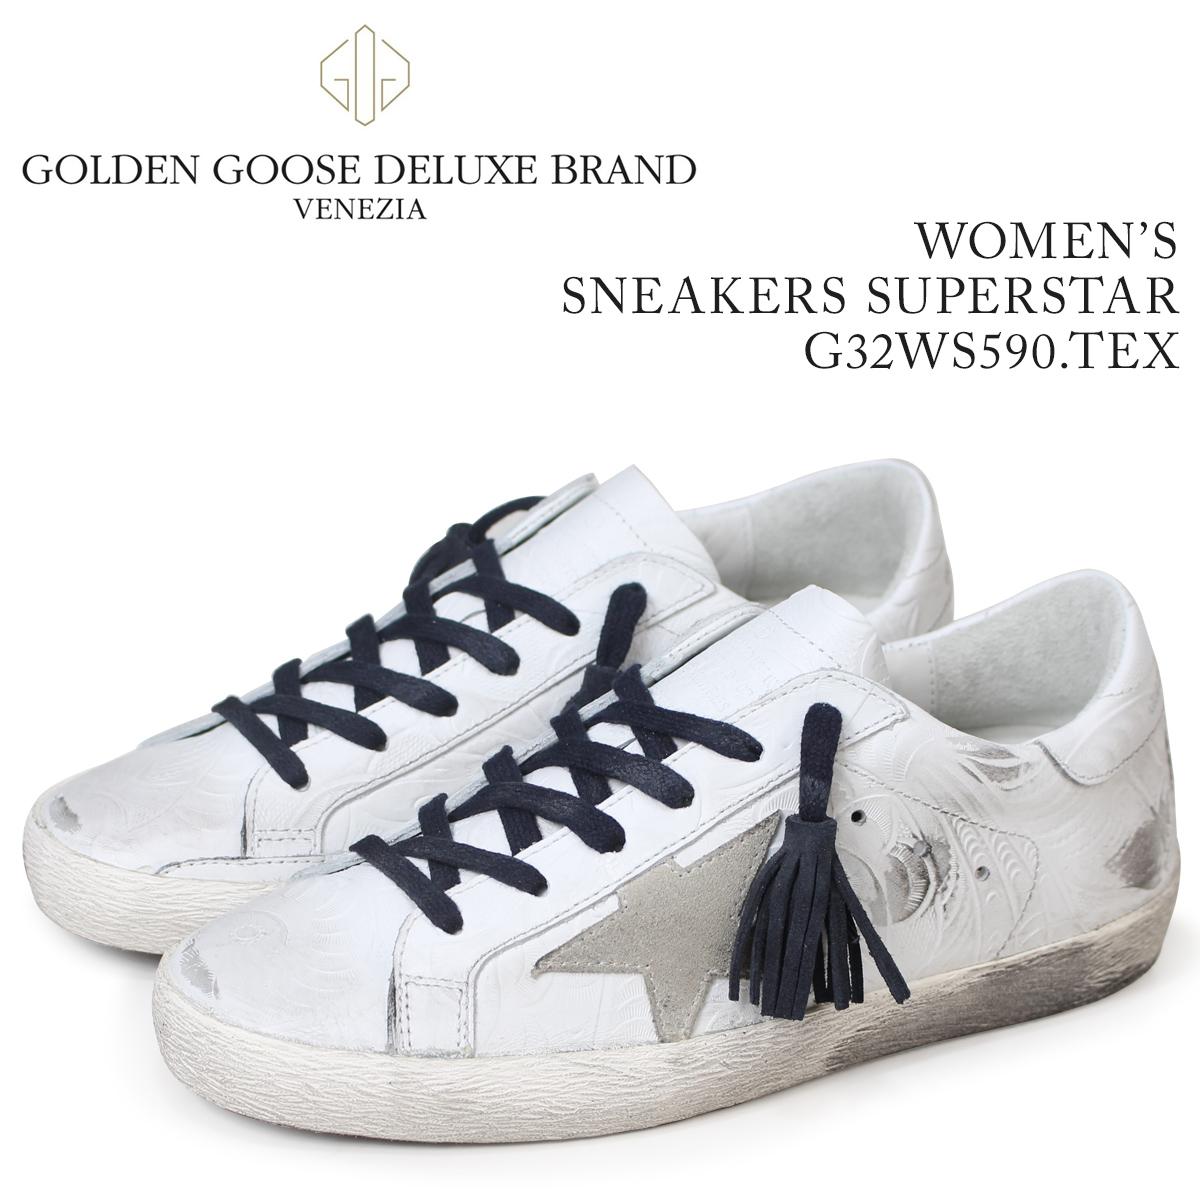 Golden Goose ゴールデングース スニーカー レディース スニーカーズ スーパースター SNEAKERS SUPERSTAR ホワイト 白 G32WS590 TEX